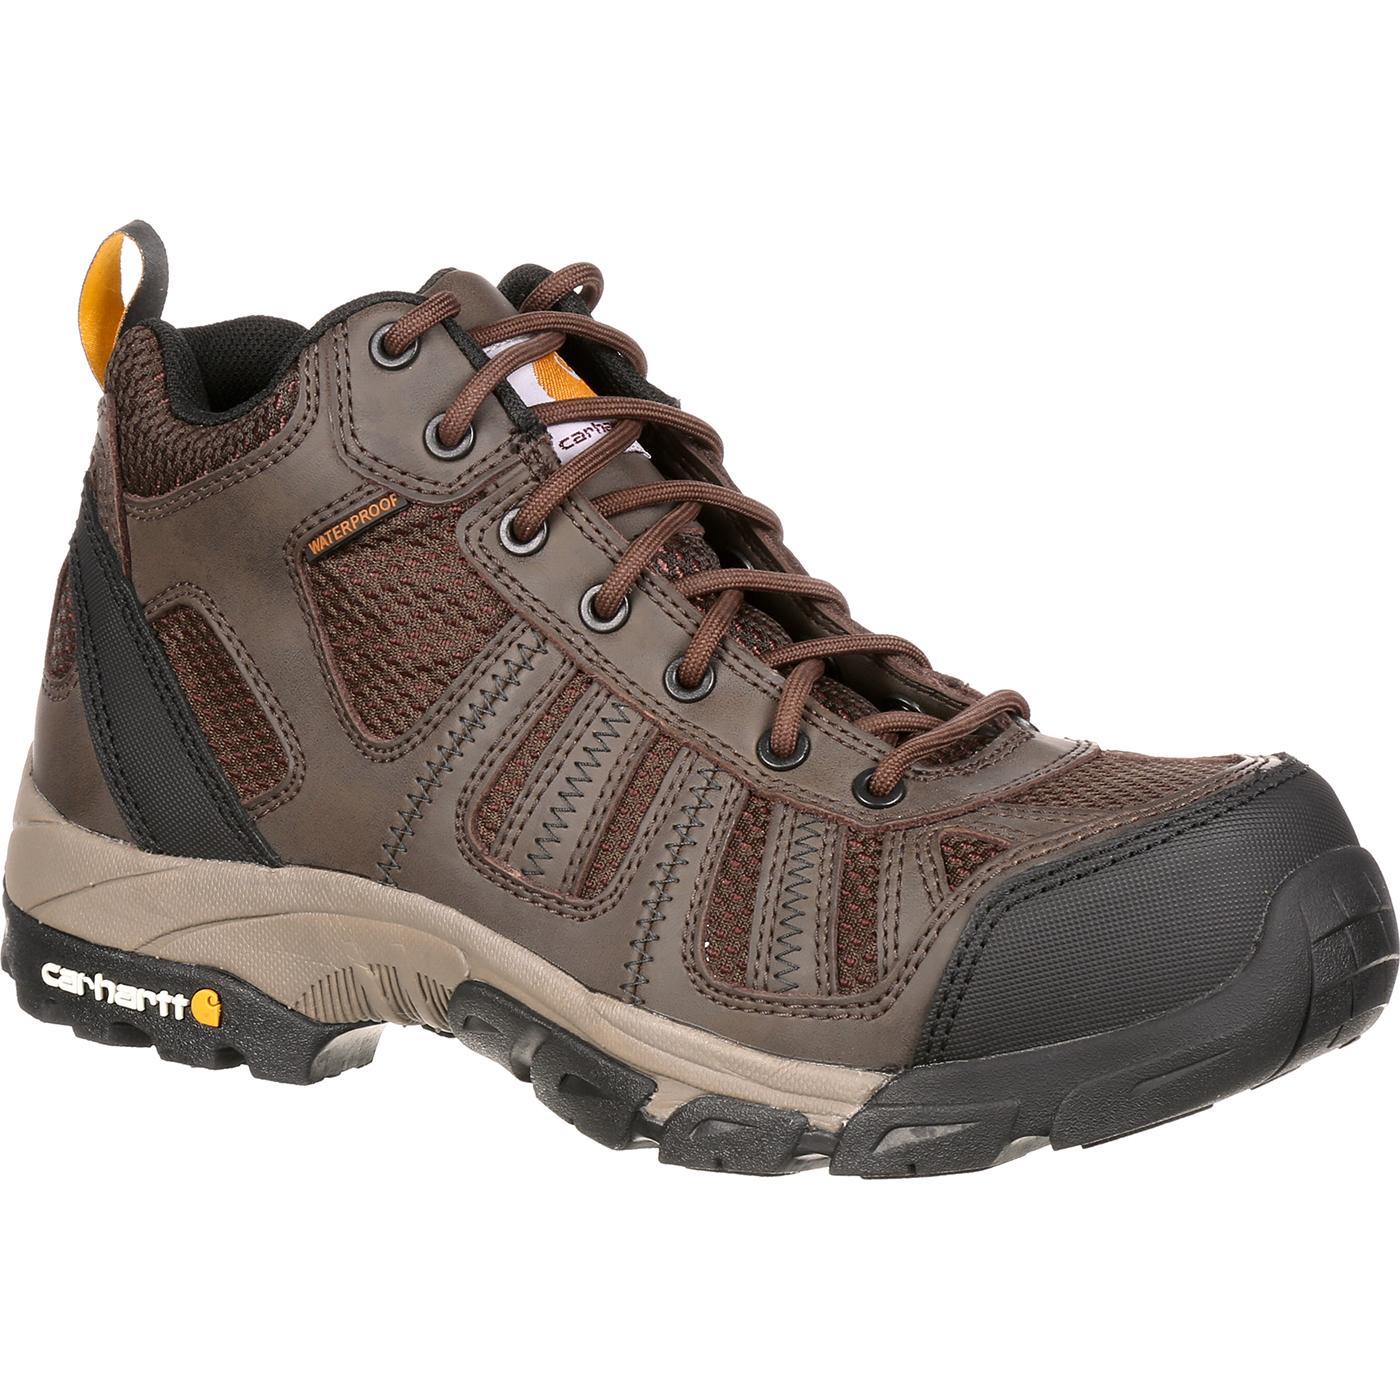 dcae7dba19b Carhartt Composite Toe Waterproof Work Hiker